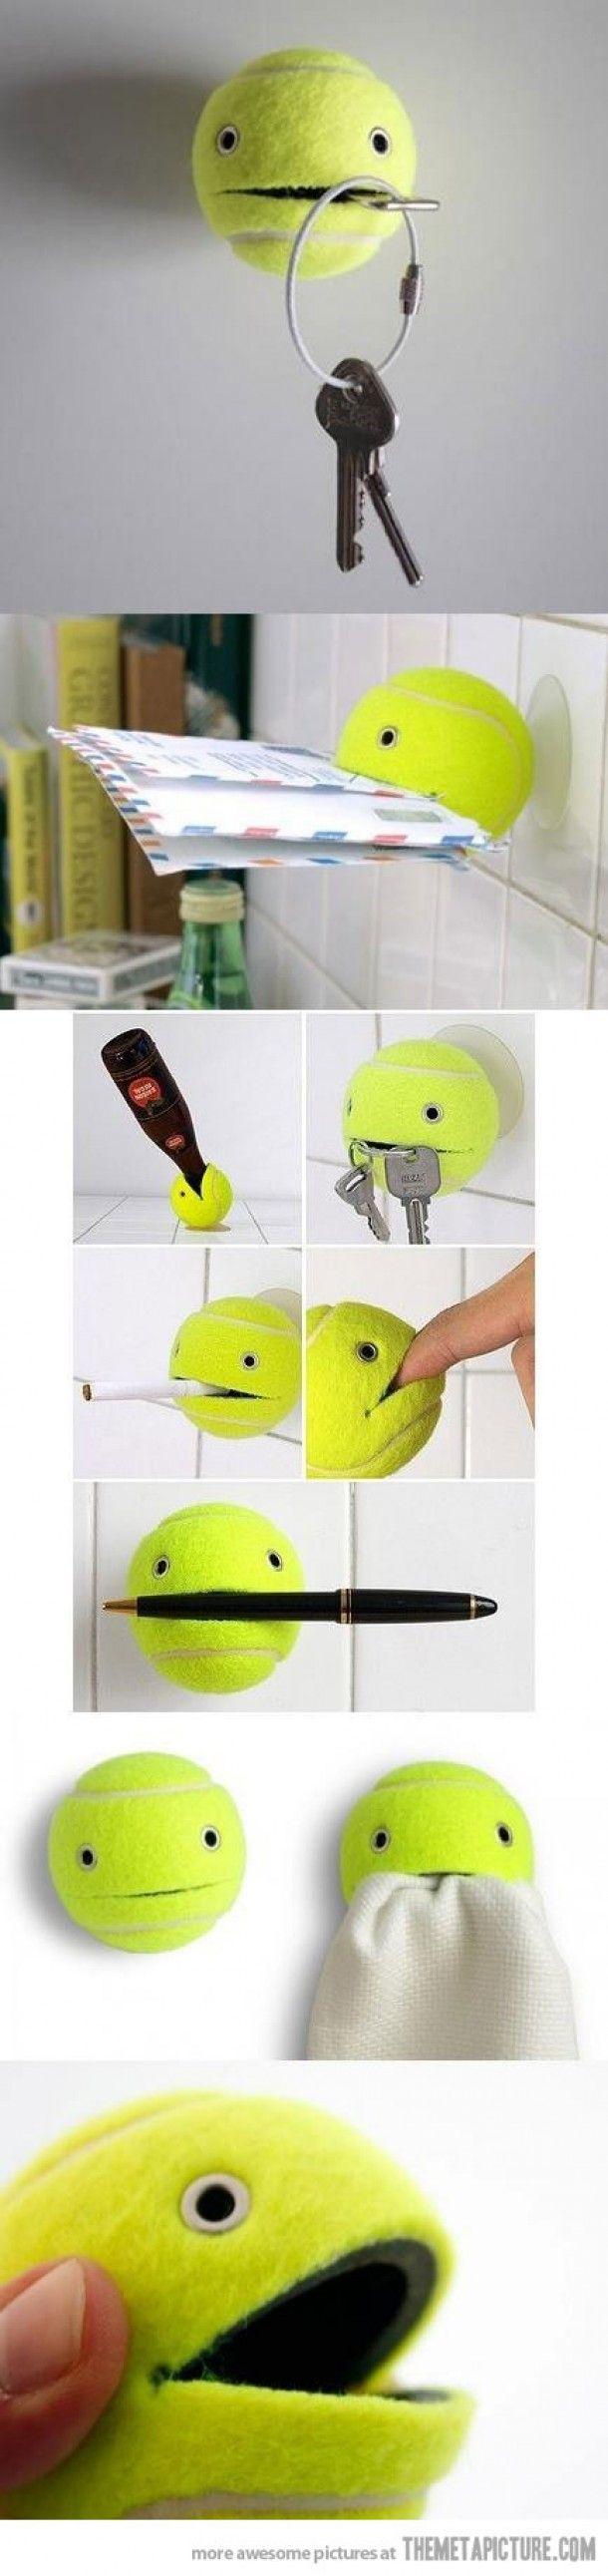 Tennis ball organization! :)